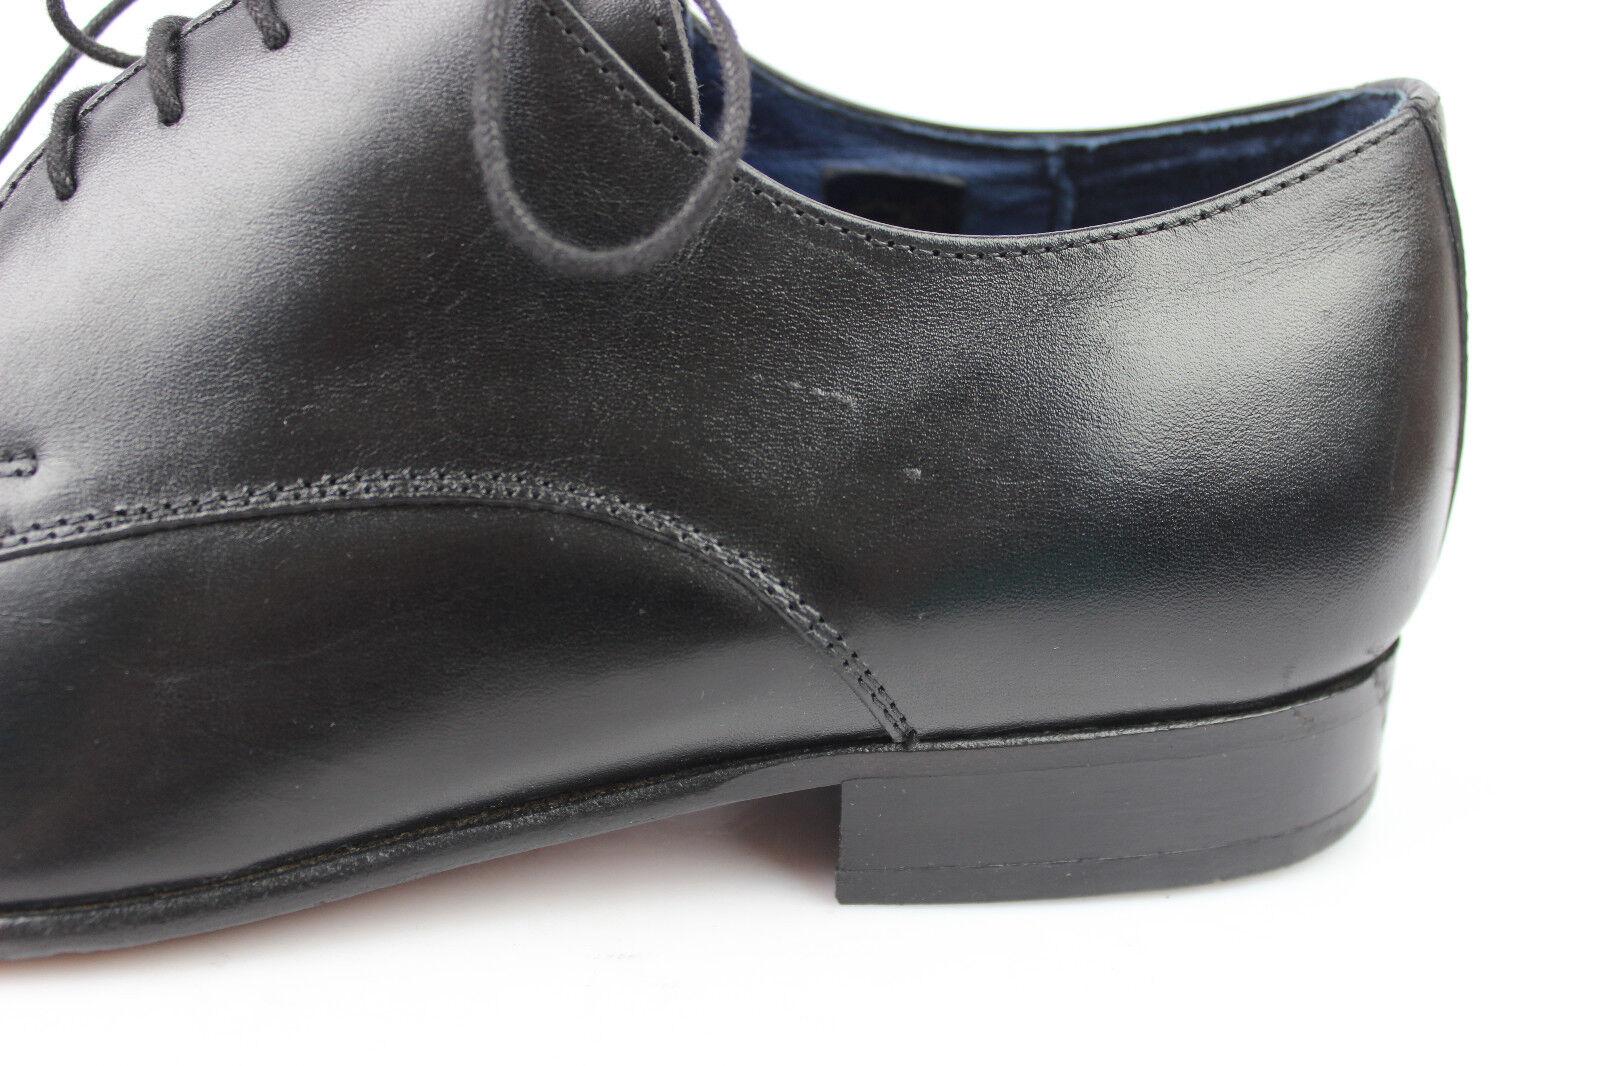 Oxfordschuhe THOMAS genäht STRENTON Vollleder genäht THOMAS schwarz t 44 sehr guter Zustand 09e1e0